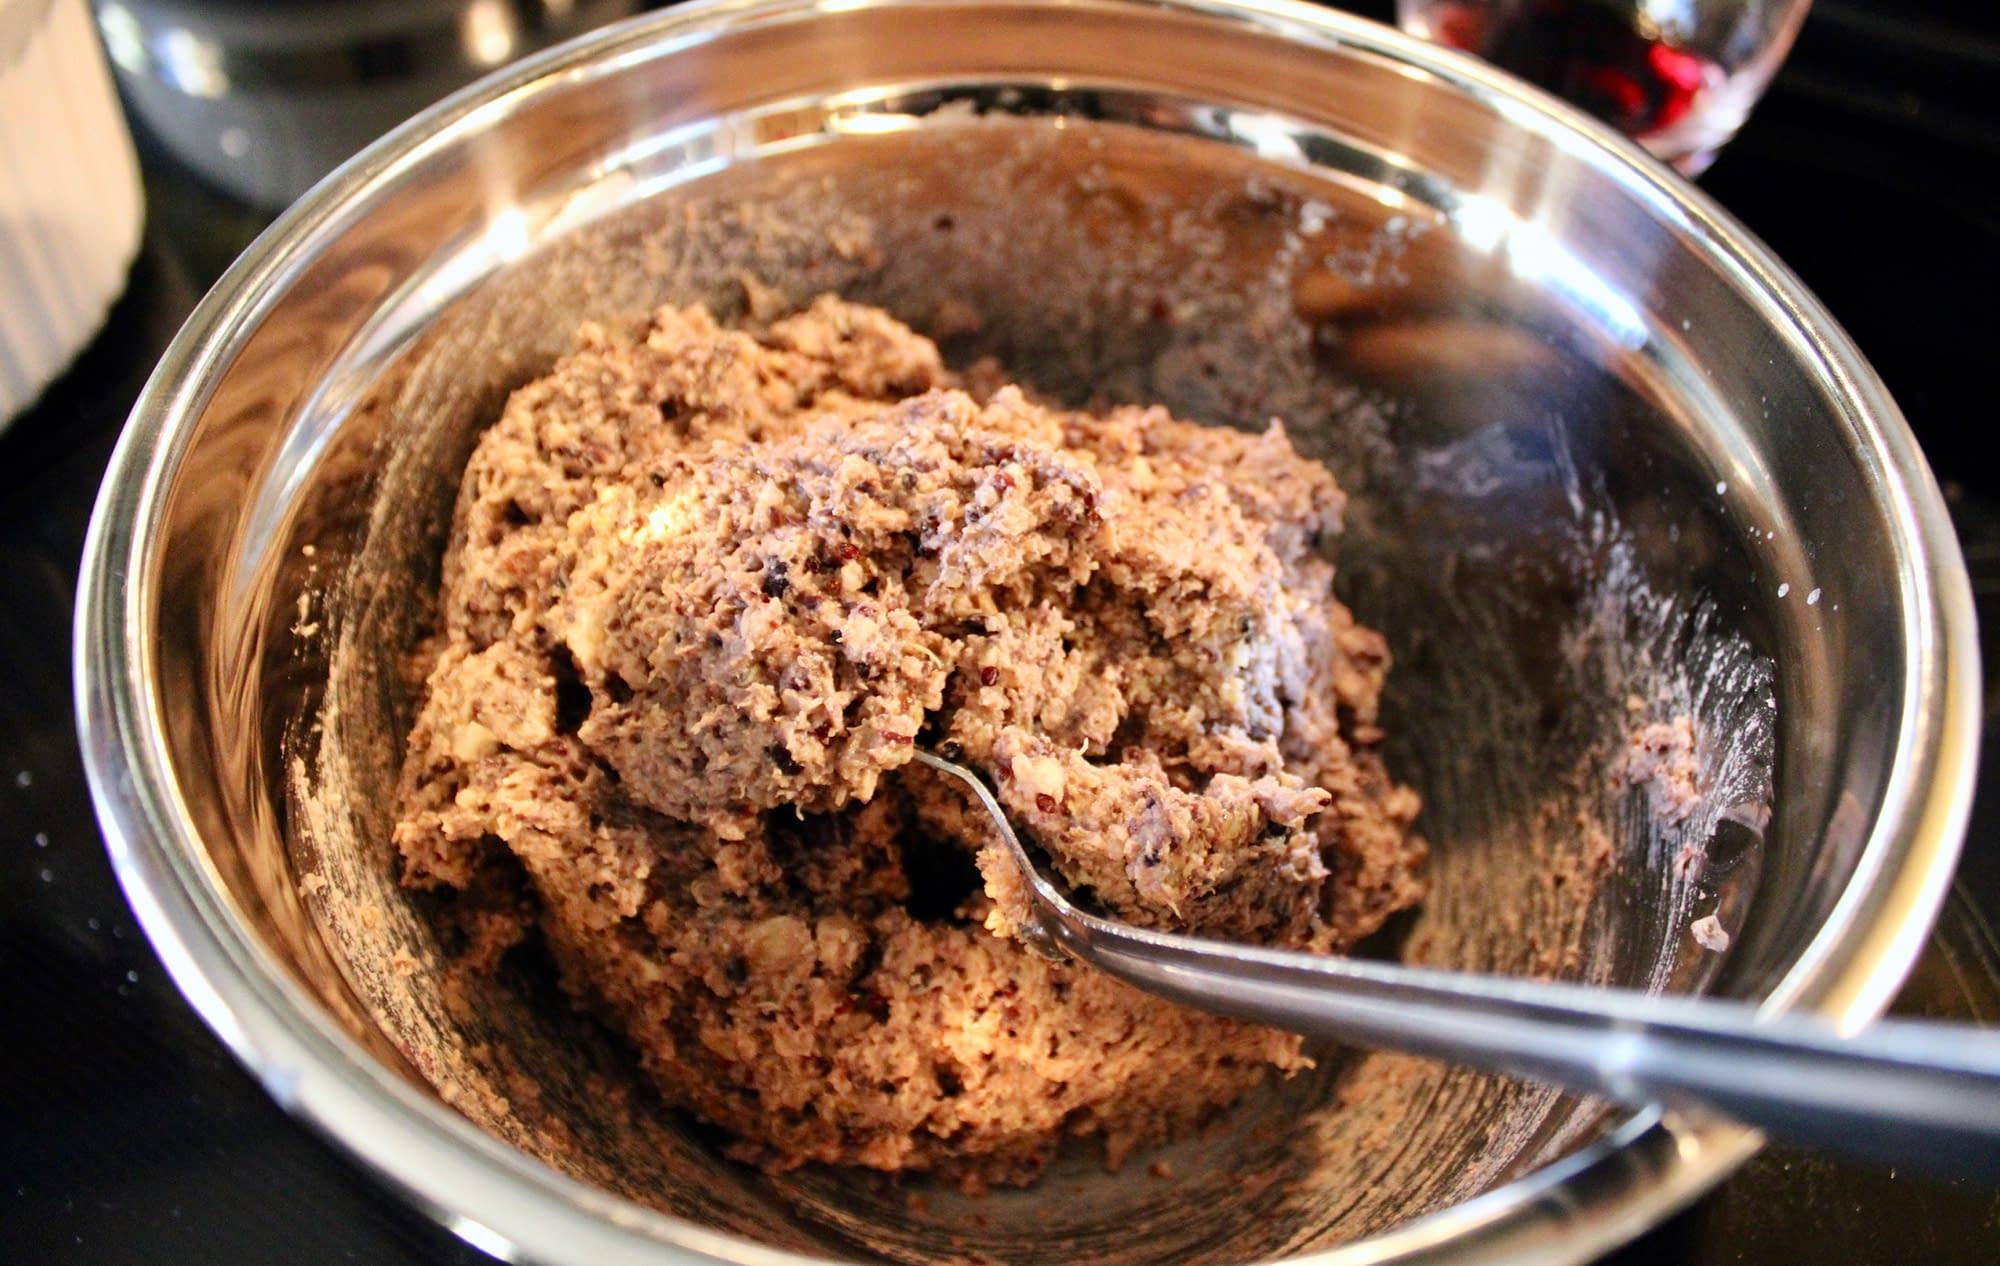 Meatloaf mixture after food processing.